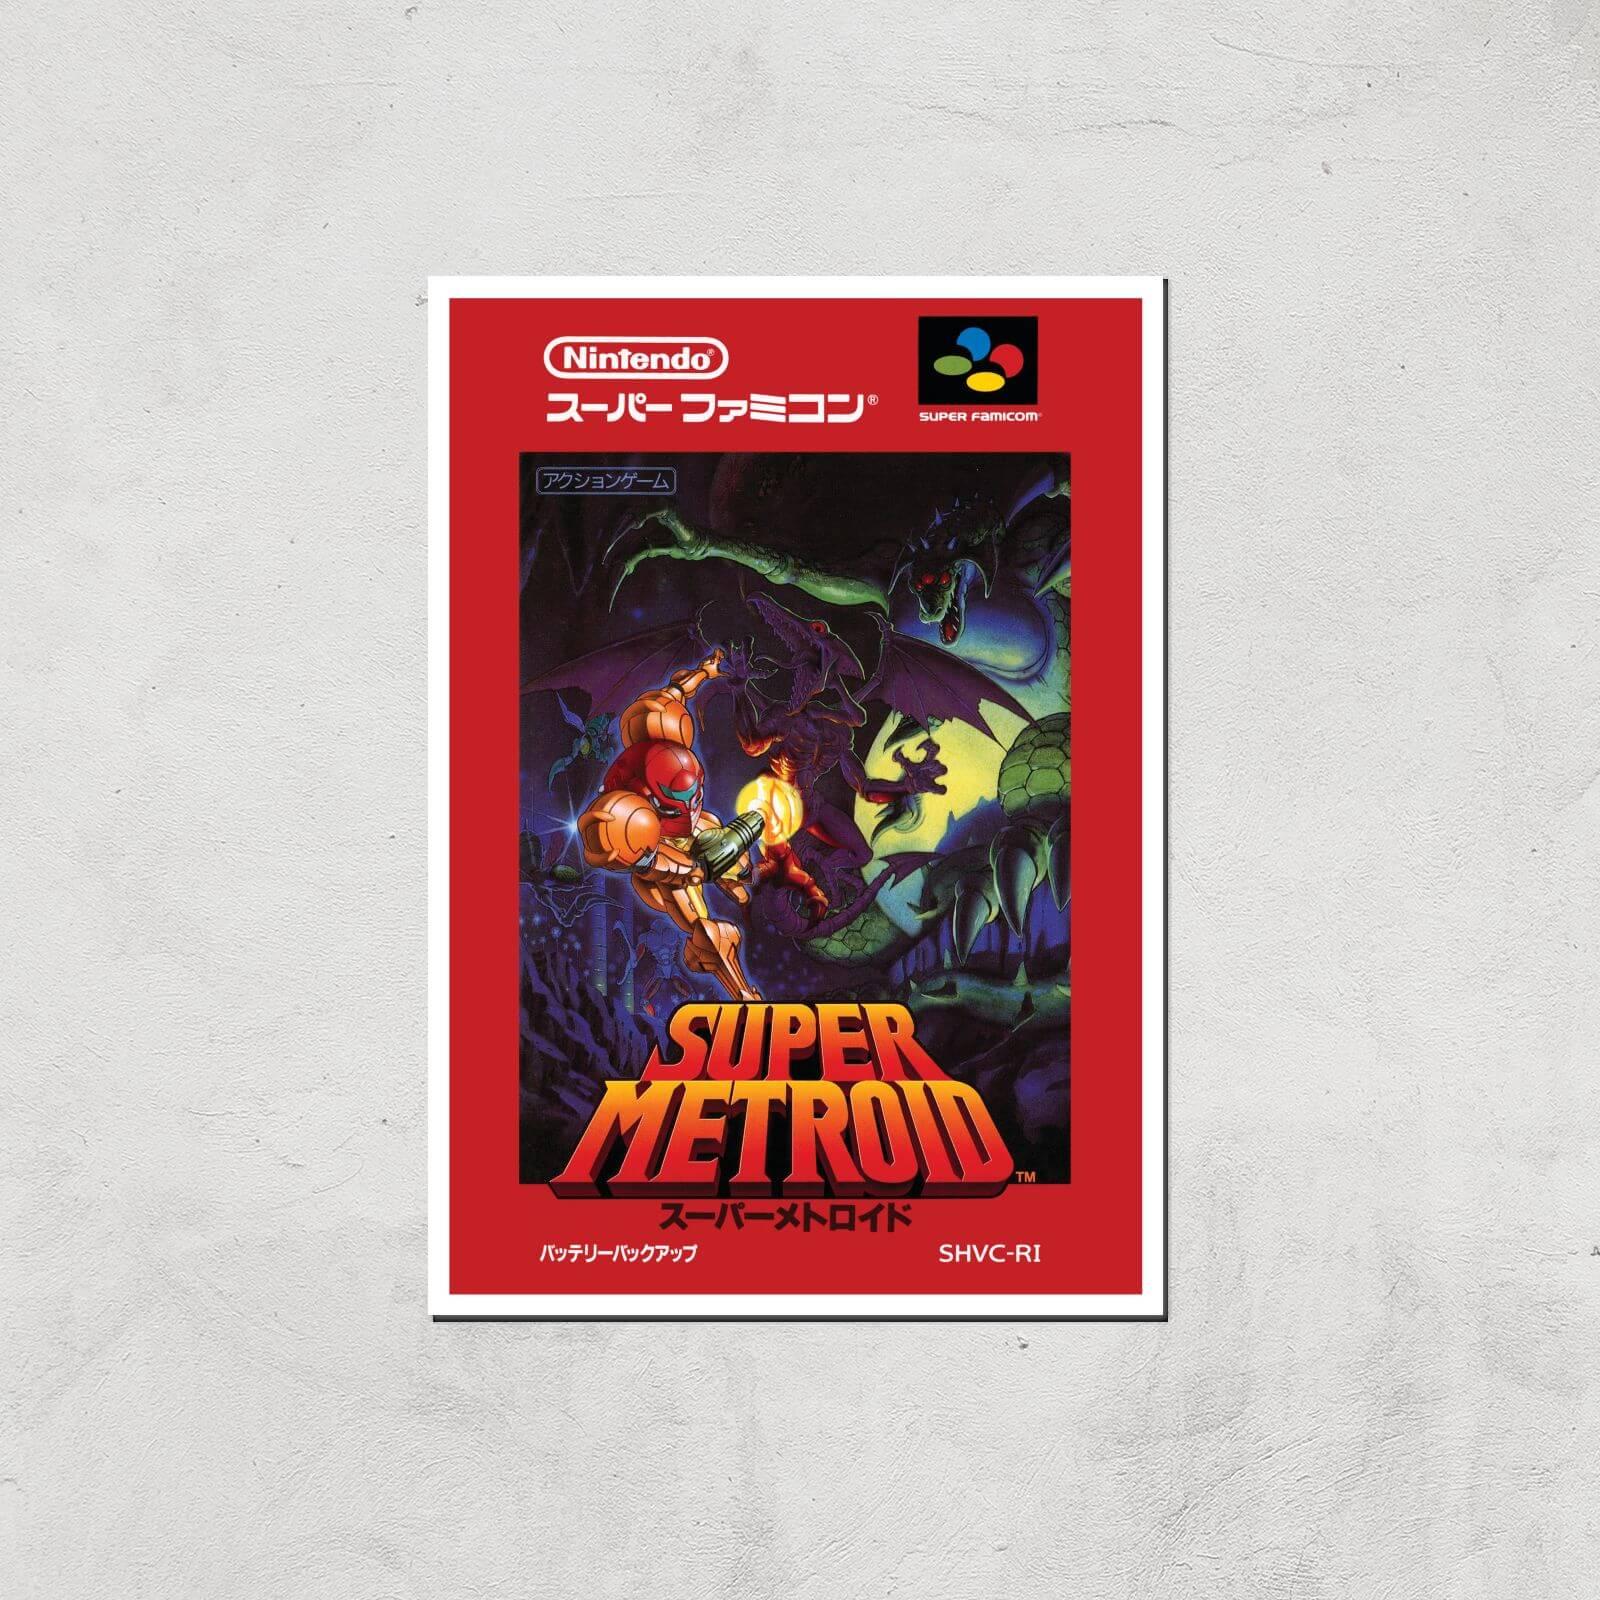 Nintendo Retro Super Metroid Cover Art Print - A3 - Print Only